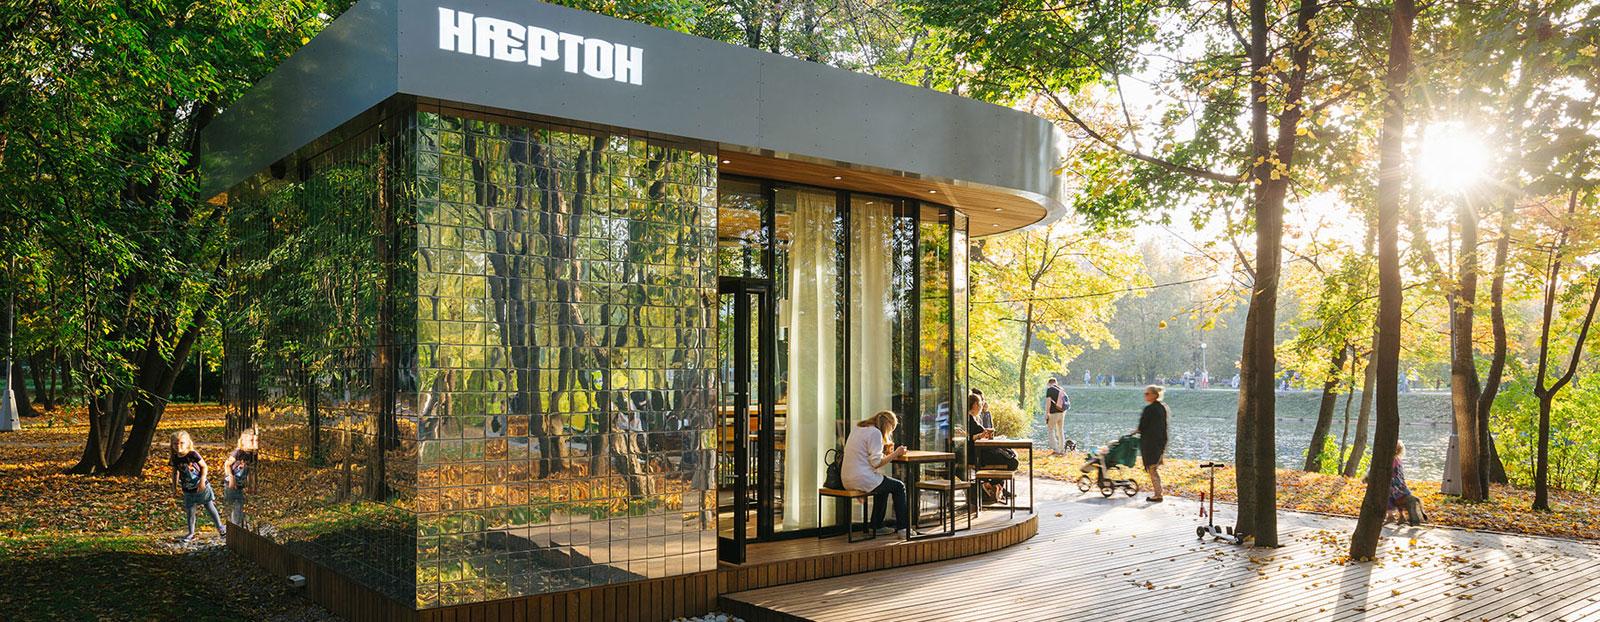 metafizika-pavilion-cafe-narton-designboom-1800